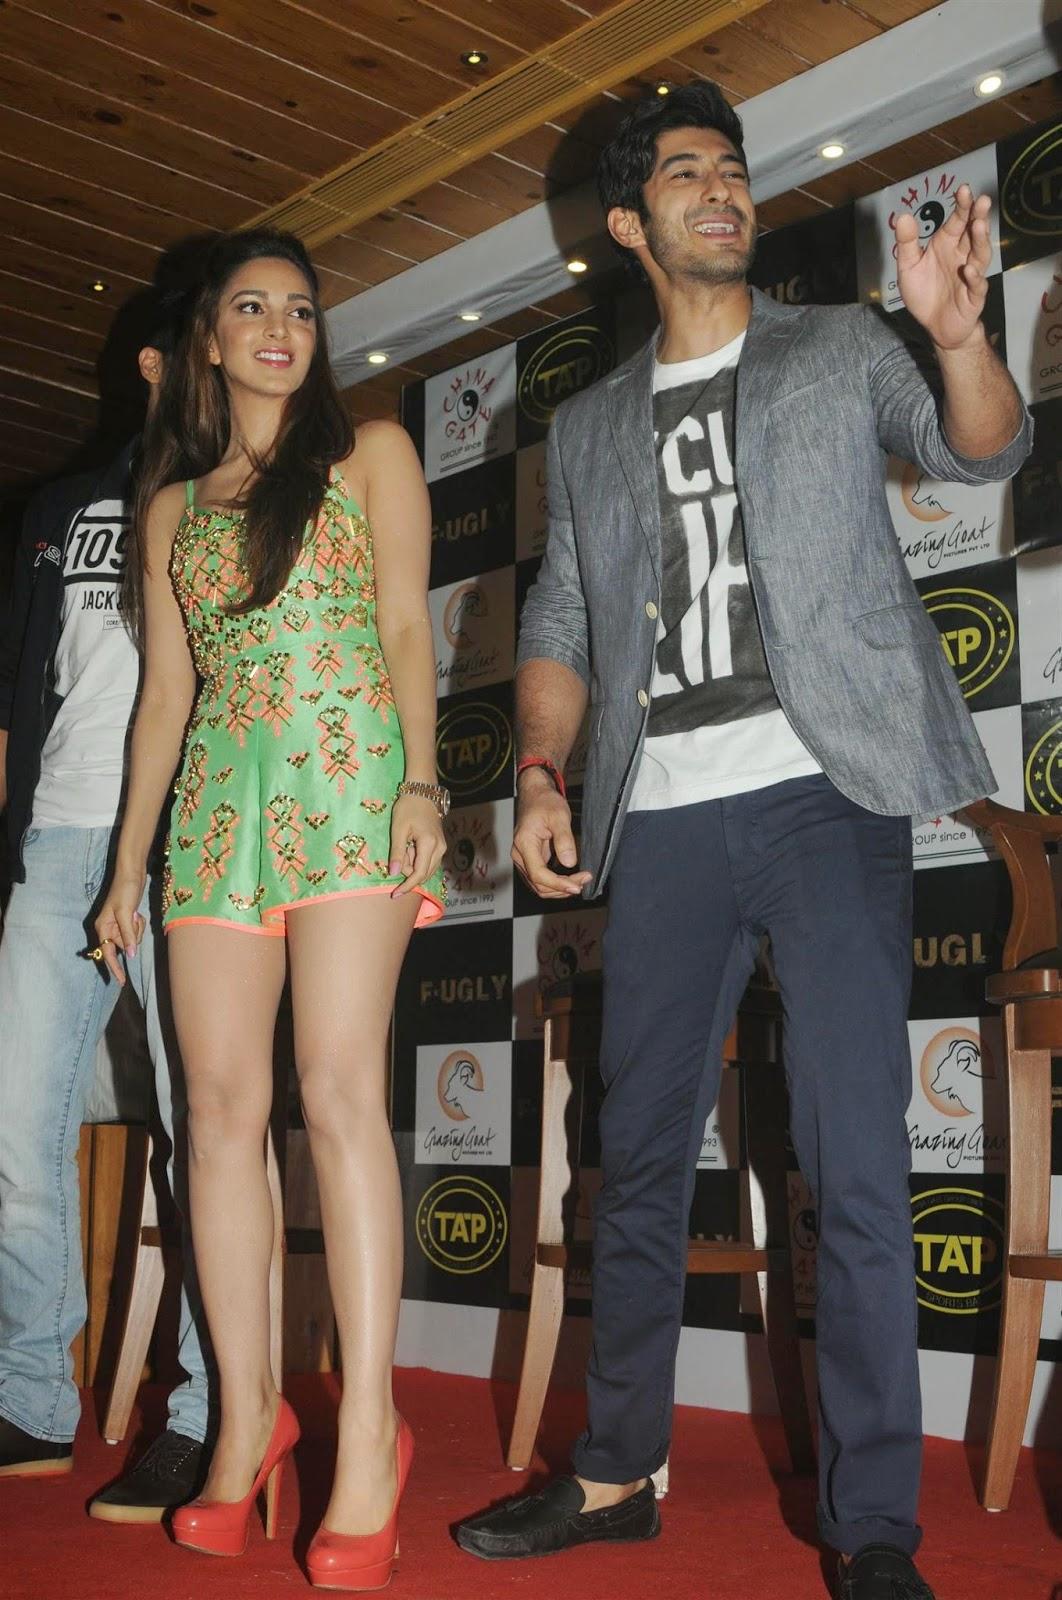 "<div>Kiara Advani Smoking Hot Legs Show At Film ""Fugly' Promotions In Mumbai ❤ ❤  ❤</div>"